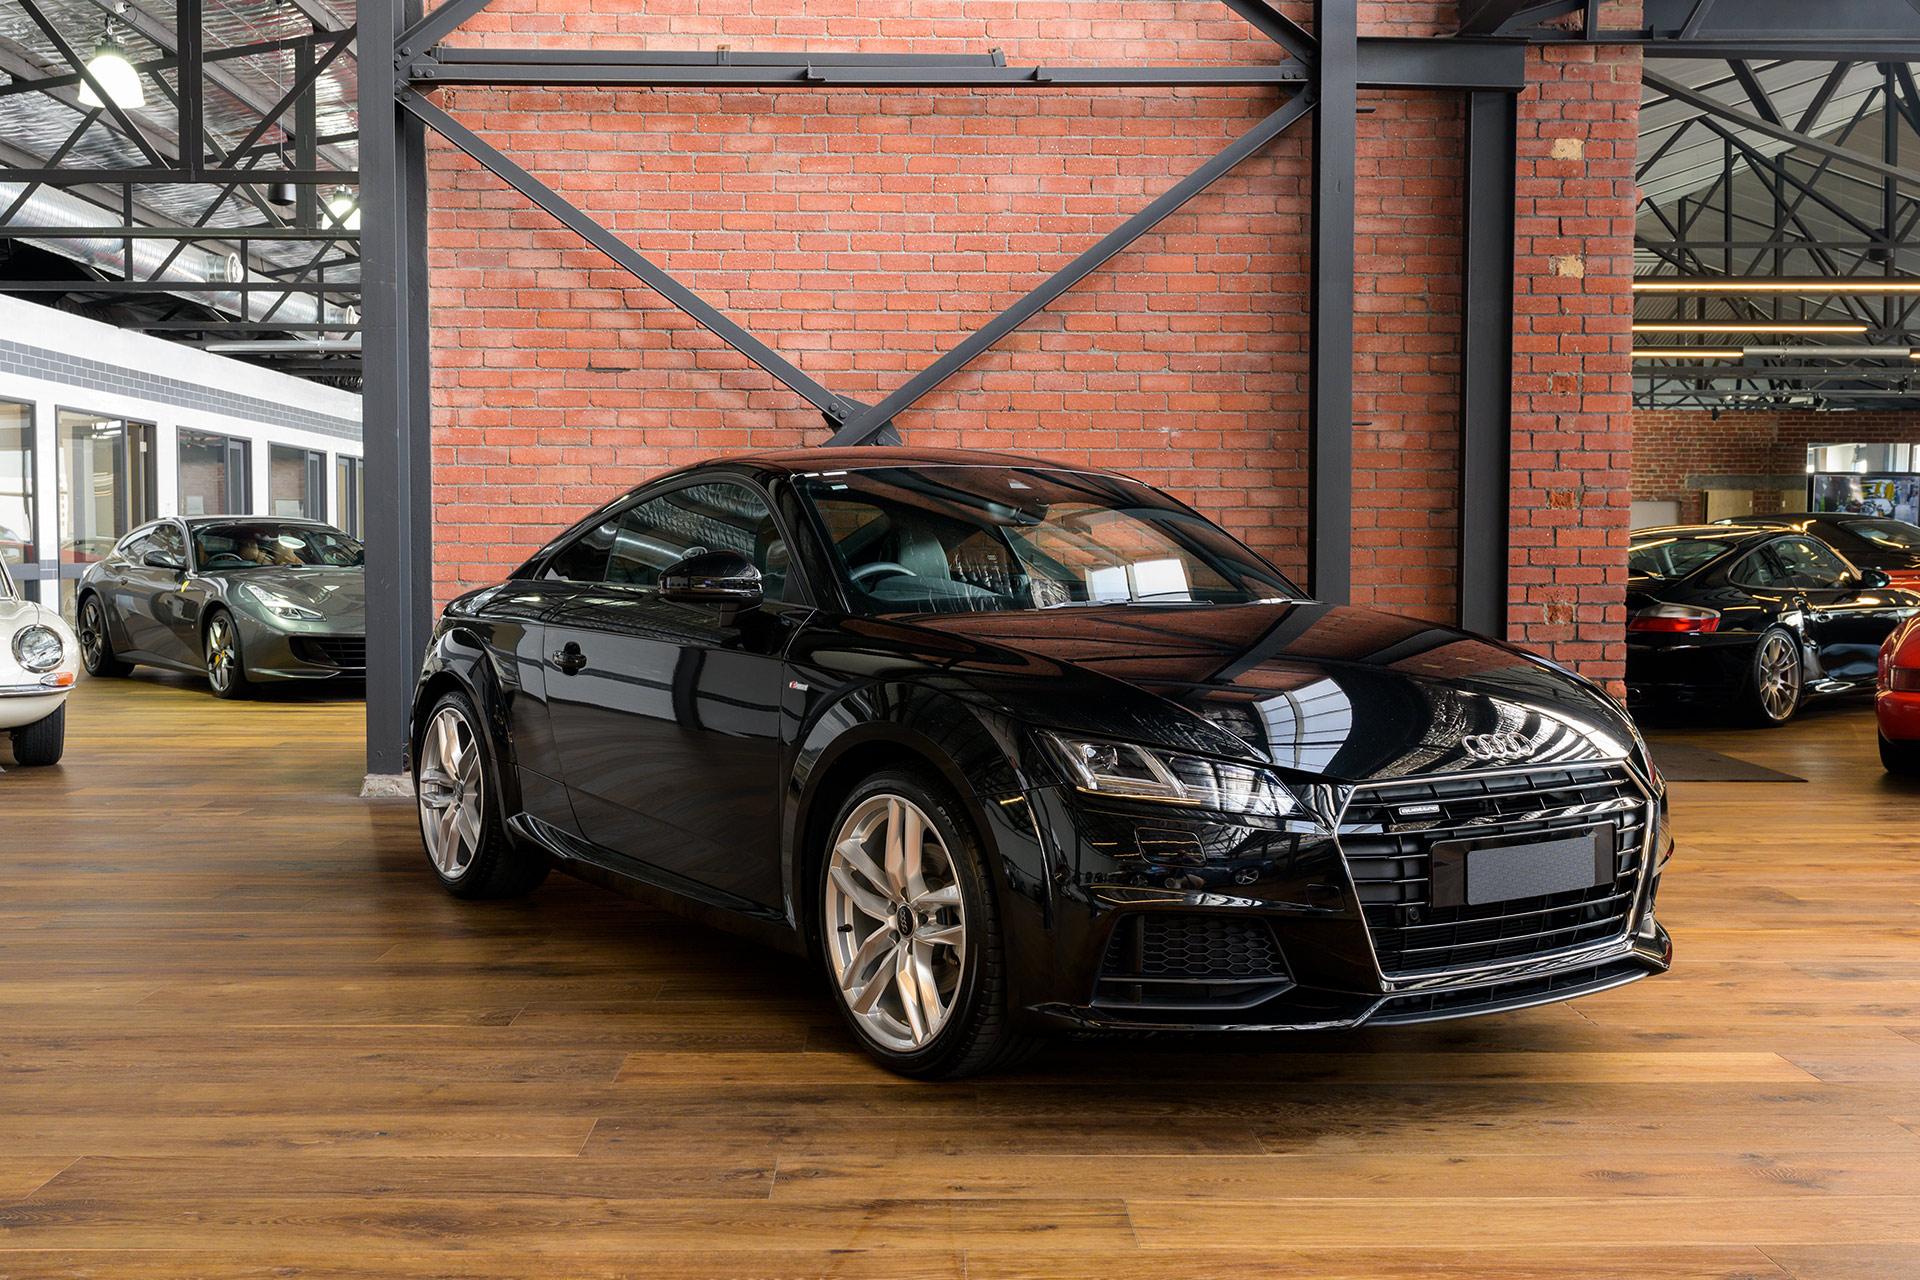 2015 Audi TT S Line Sport Coupe Quattro - Richmonds - Classic and Prestige  Cars - Storage and Sales - Adelaide, Australia